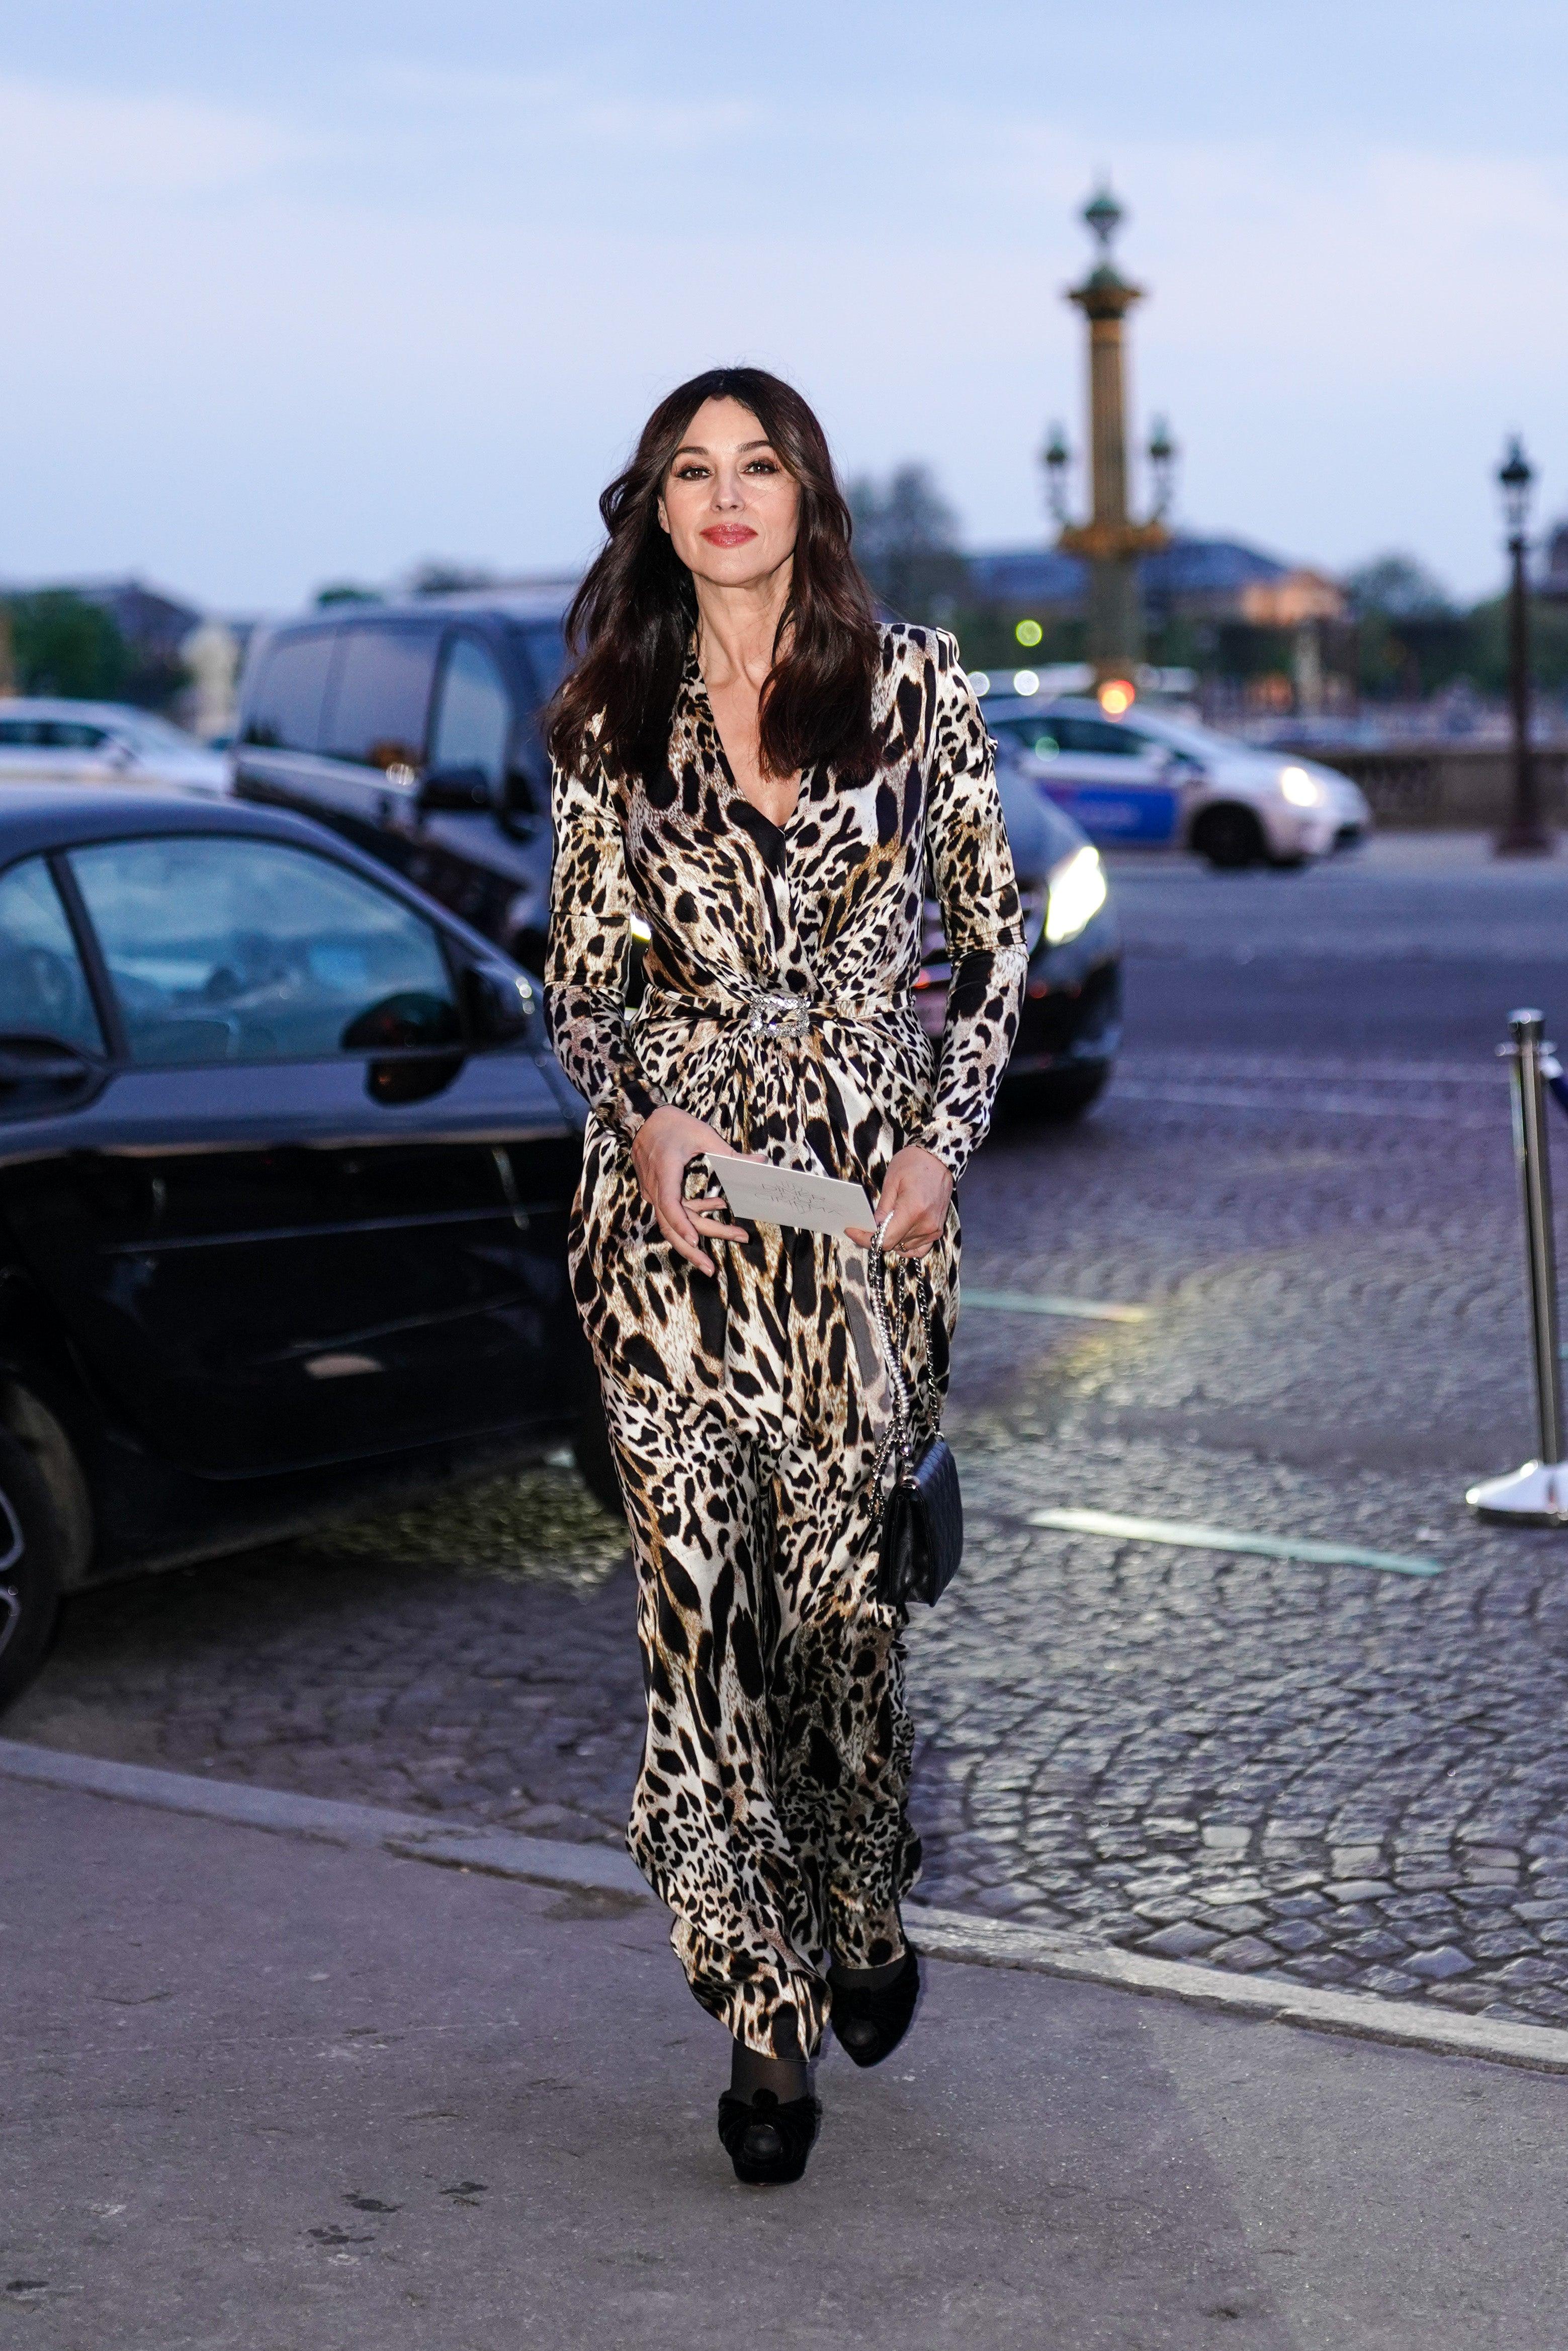 Monica Bellucci 12. dubna 2019 v Paříži Autor: Edward Berthelot/GC Images